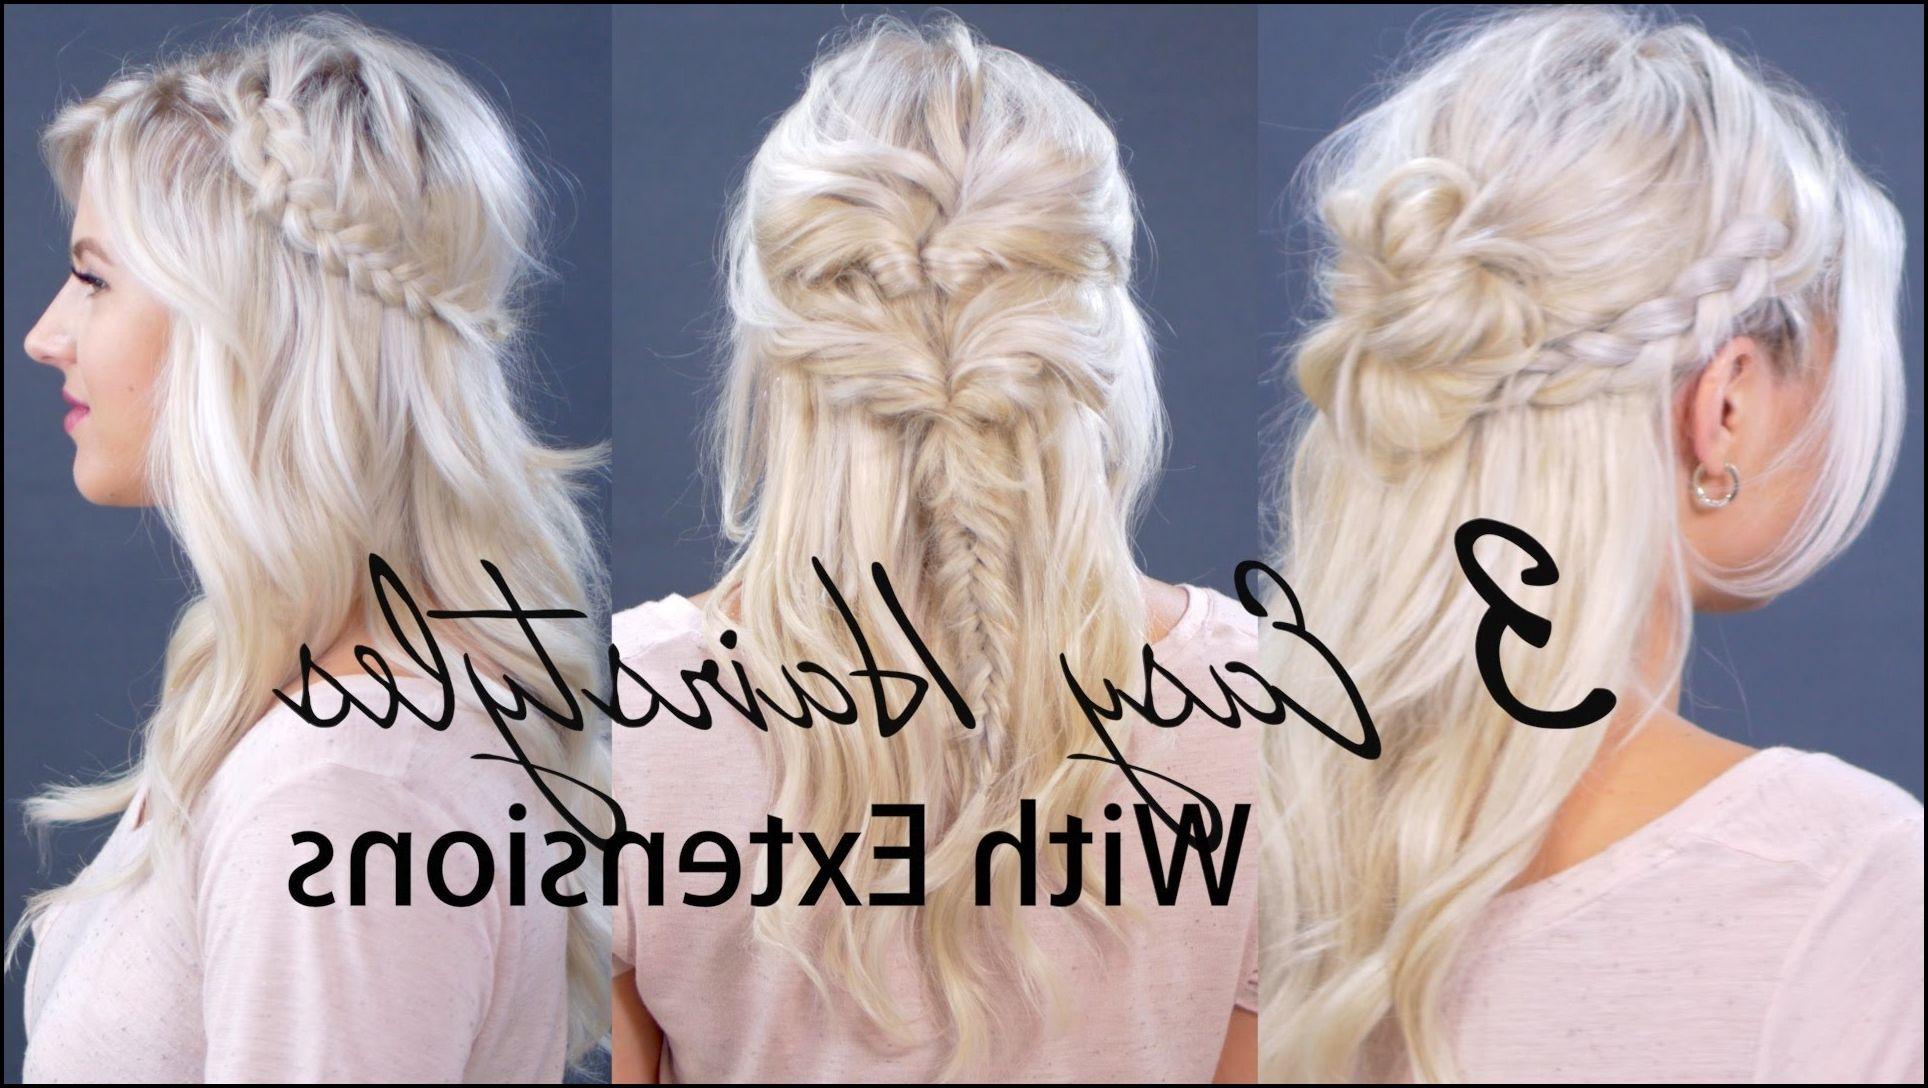 Hair Extension As One Of Popular Hairstyles Frisuren Mit Haarverlangerung Lange Haare Stylen Haarverlangerung